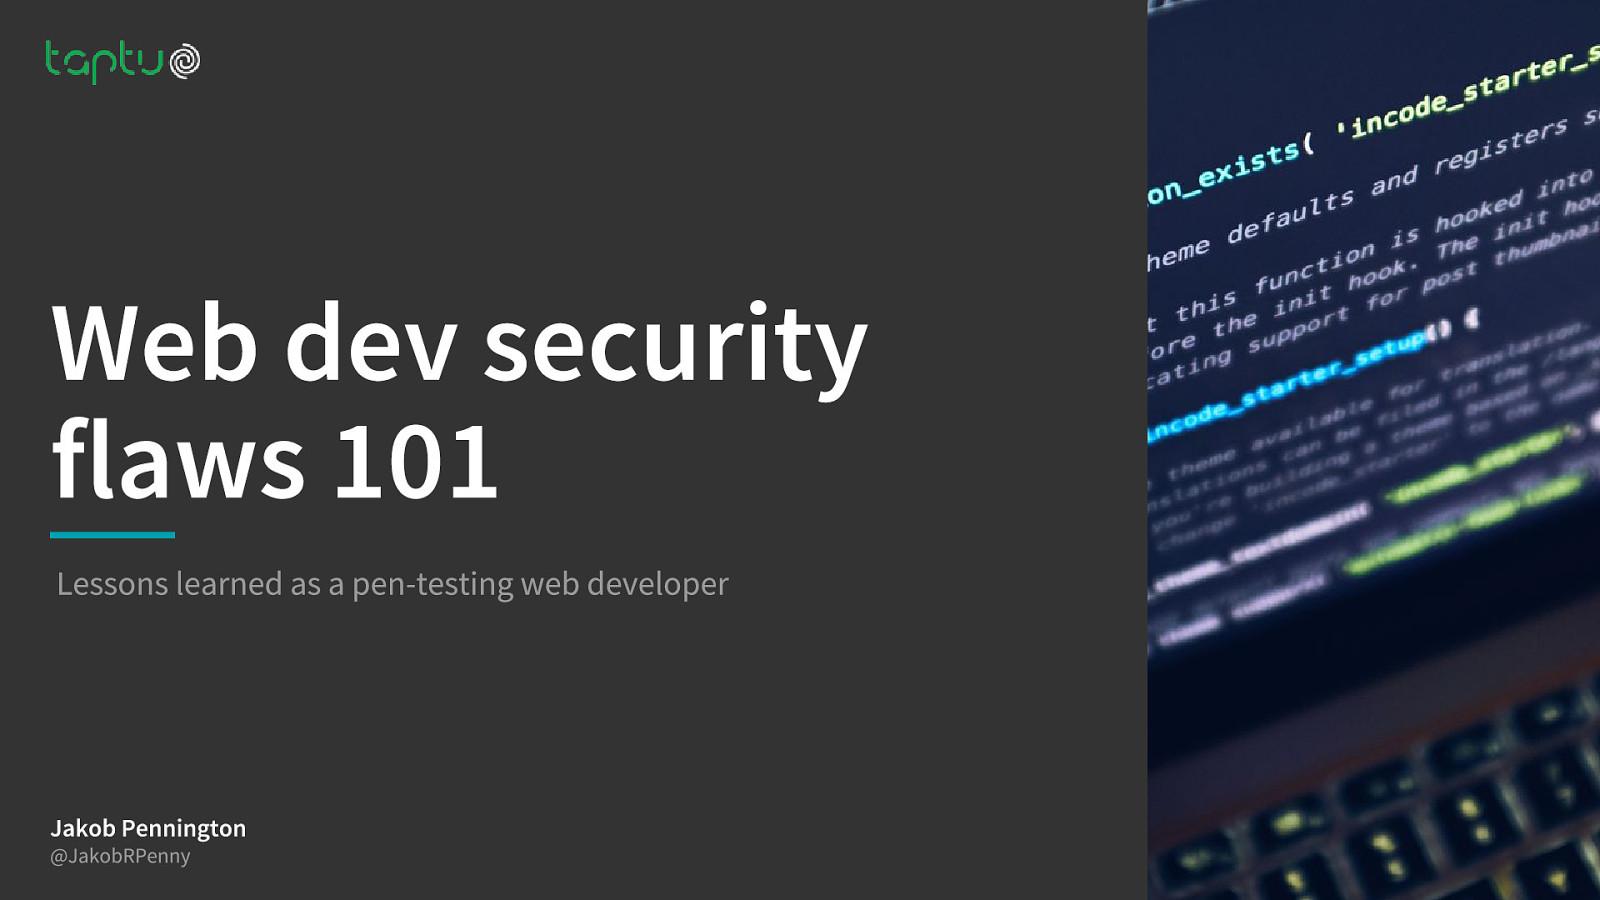 Web Dev Security Flaws 101